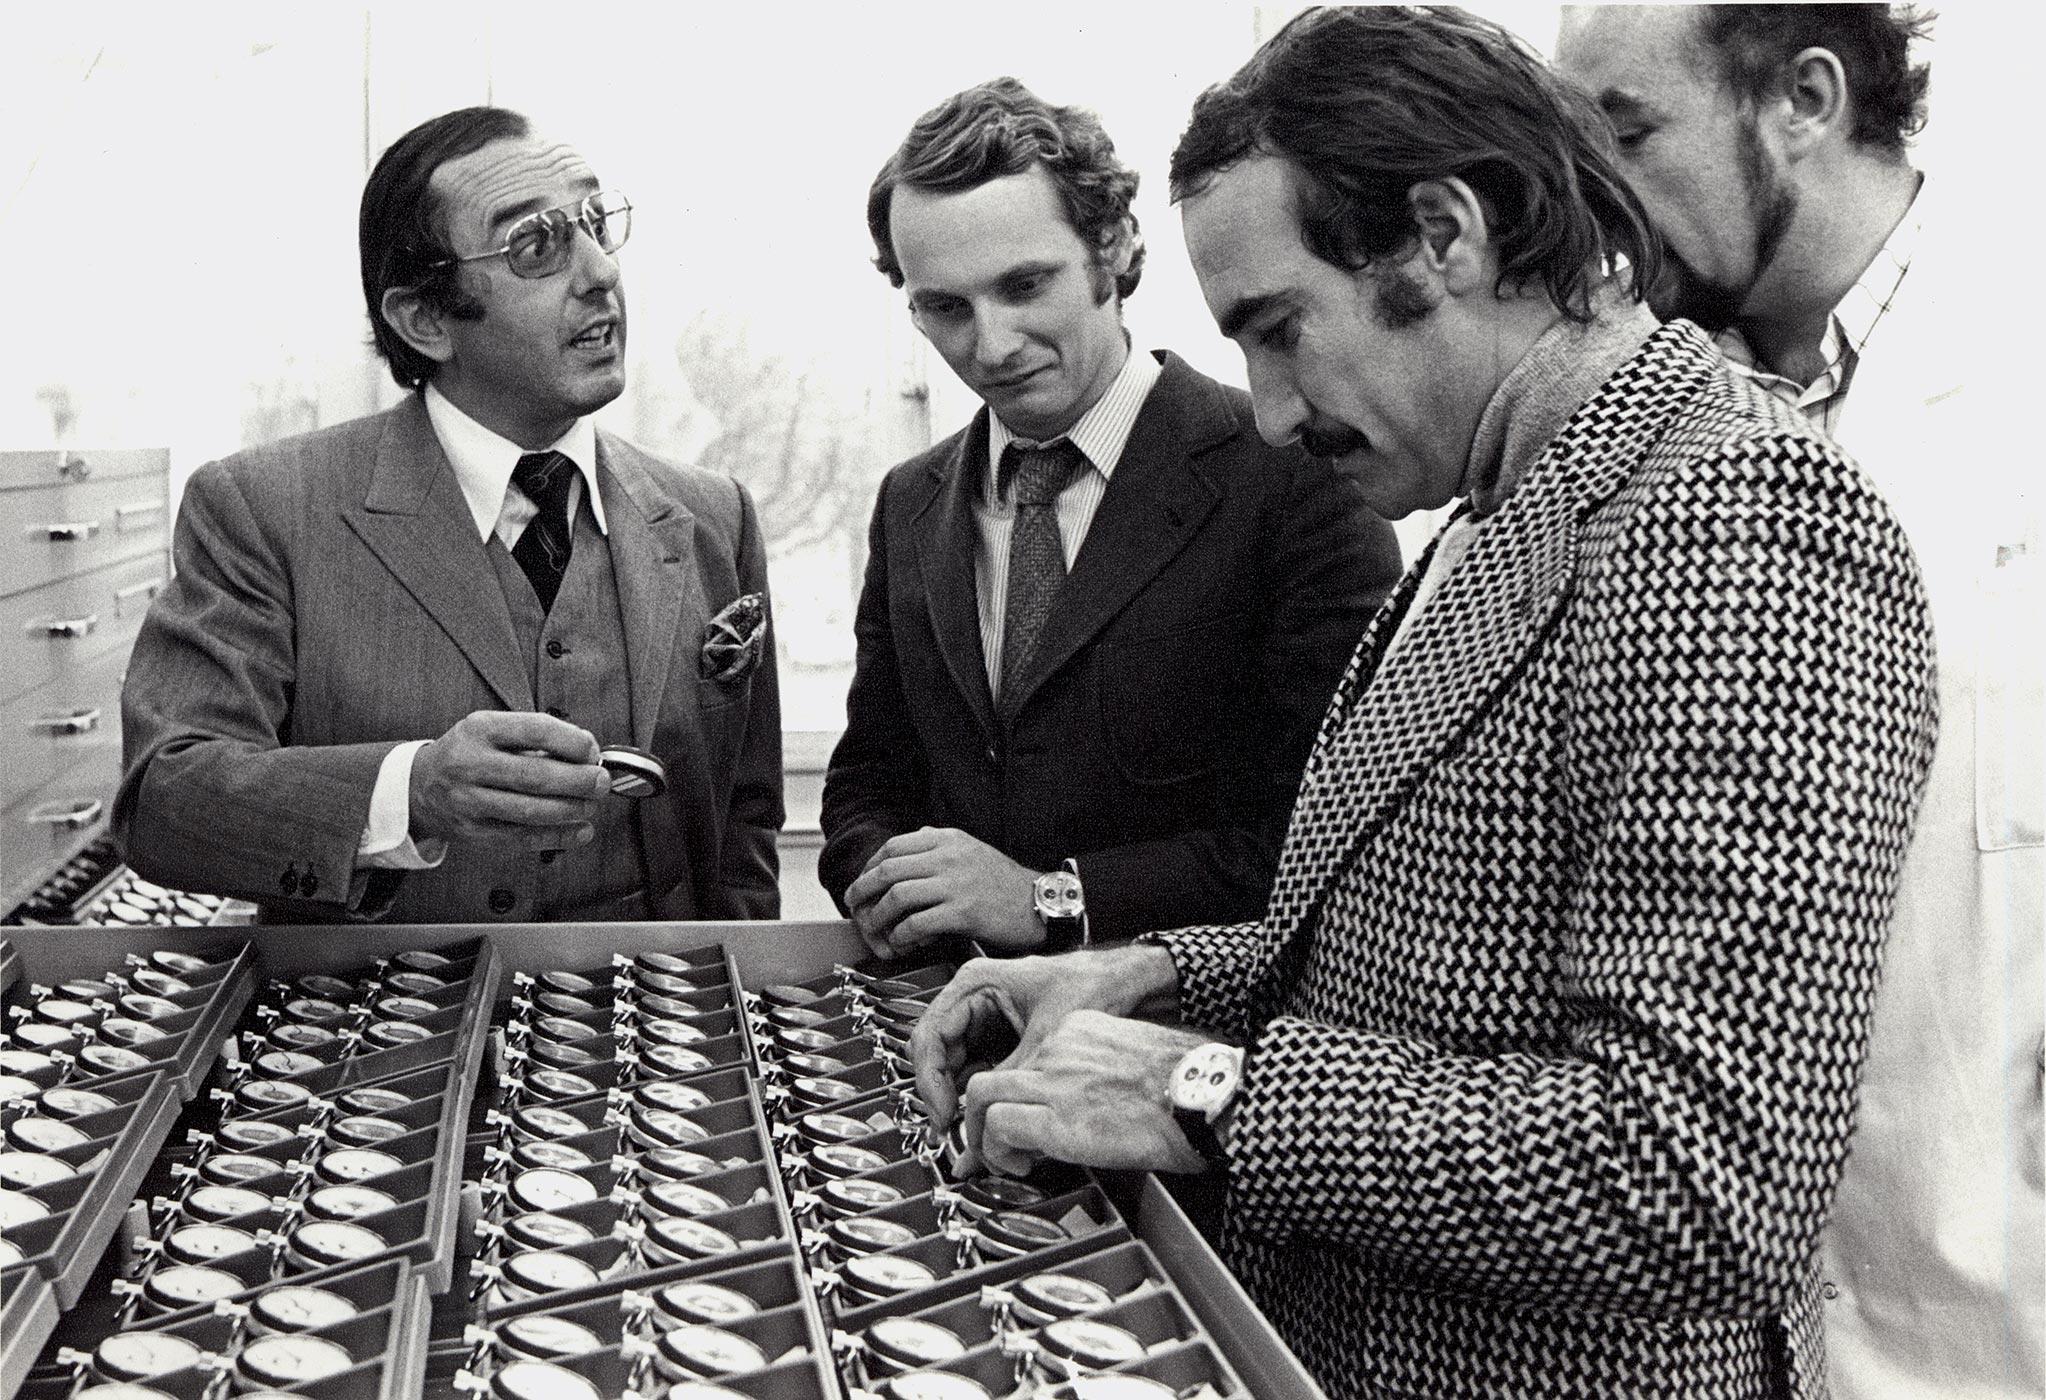 Jack Heuer + Niki Lauda + Clay Regazzoni (2)